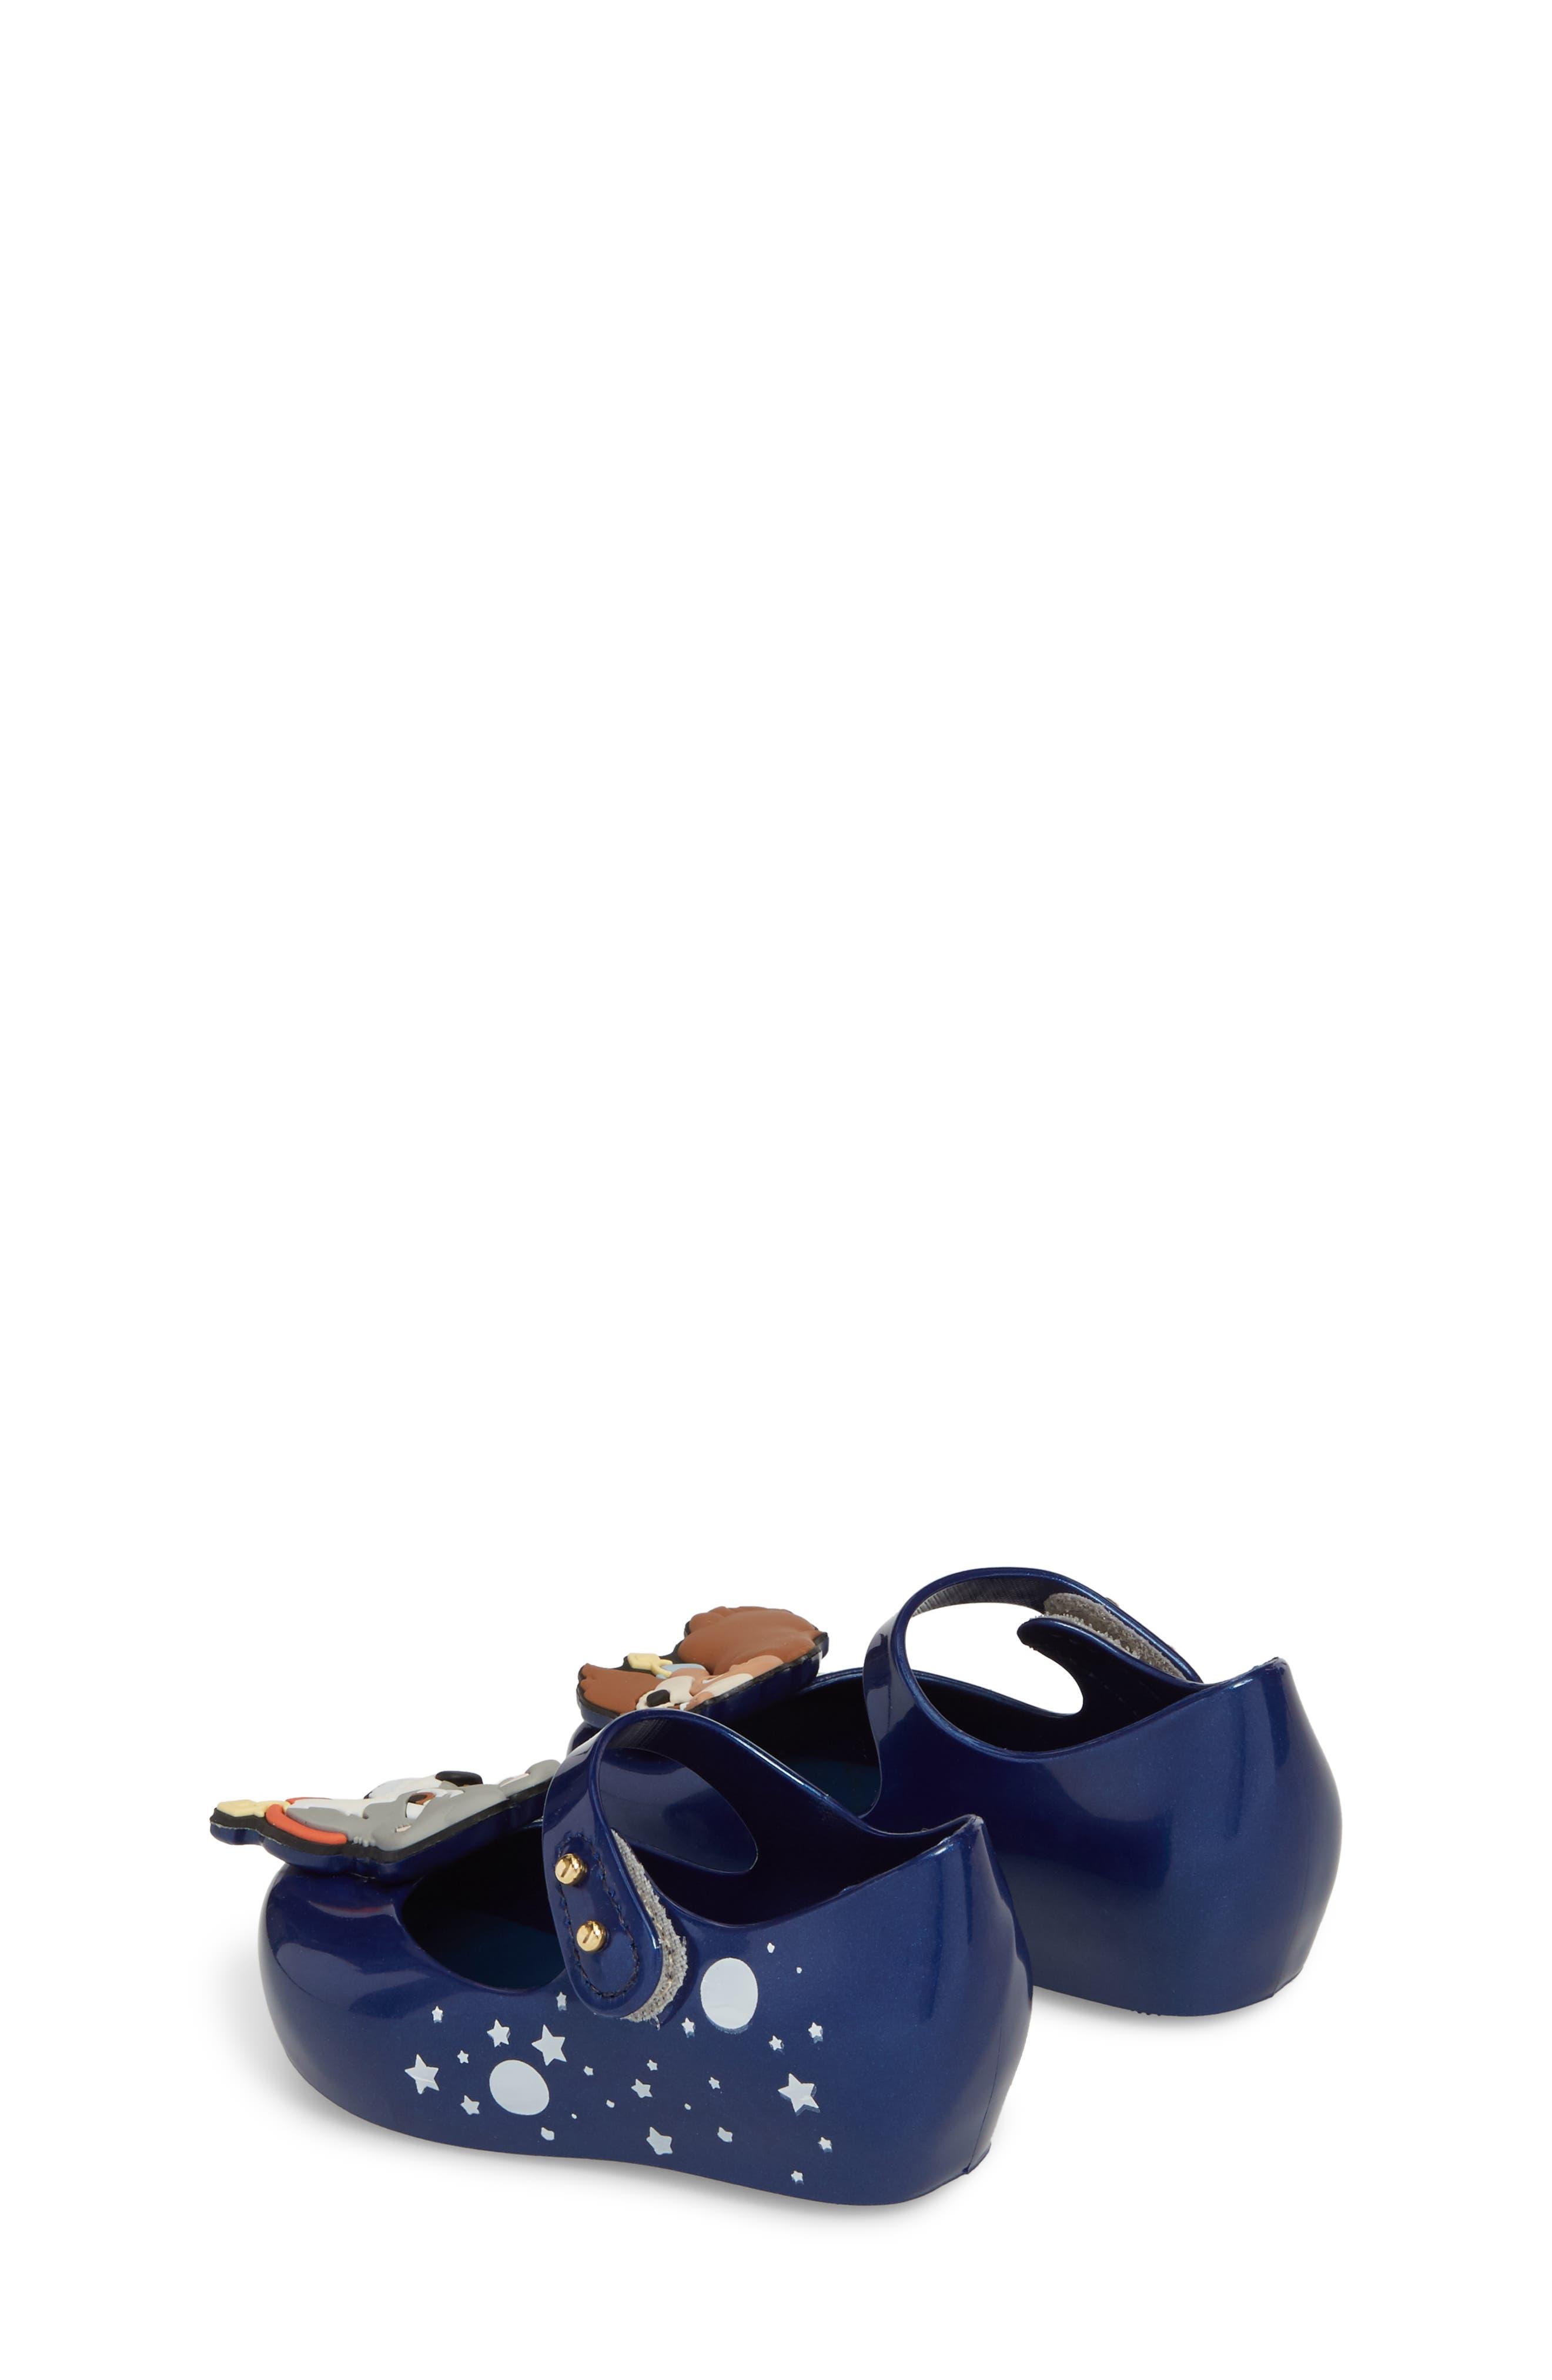 Disney<sup>®</sup> Lady & the Tramp Mini Ultragirl Flat,                             Alternate thumbnail 8, color,